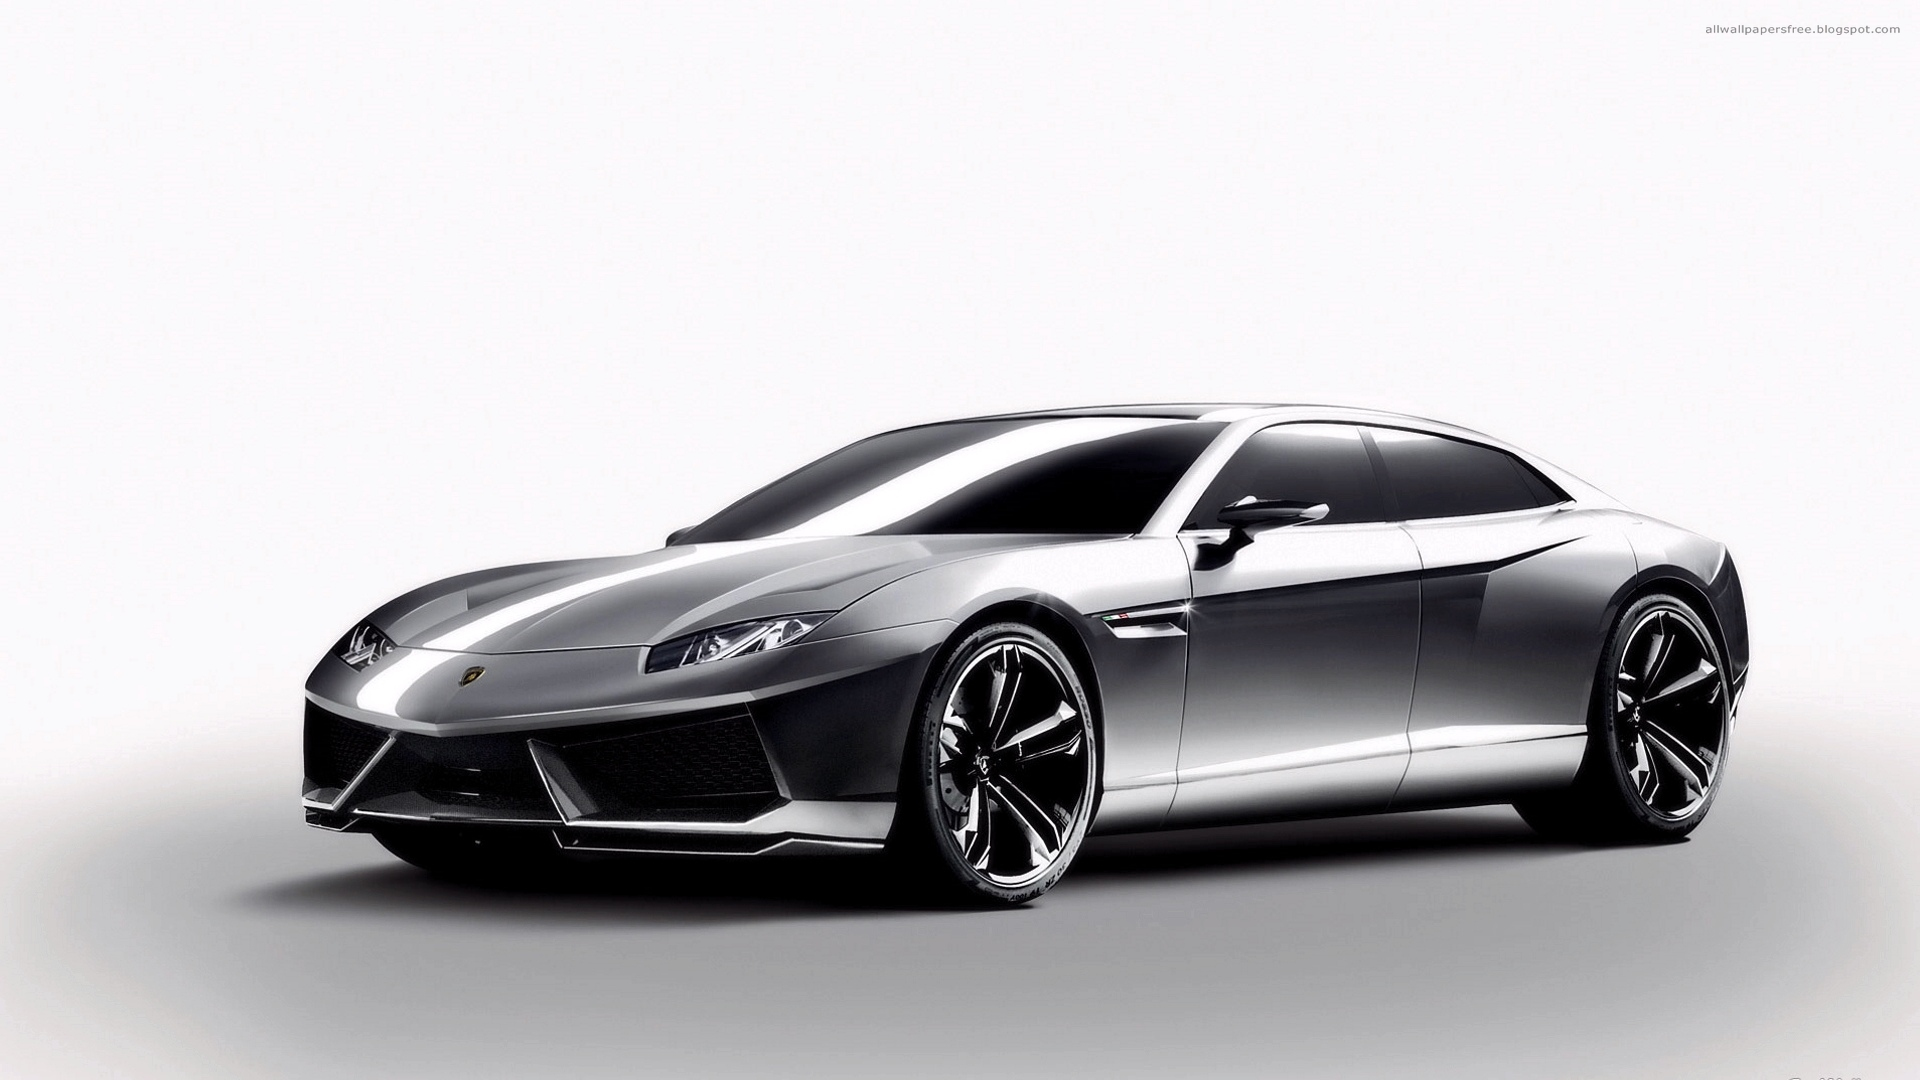 Download full size Lamborghini wallpaper / Cars / 1920x1080